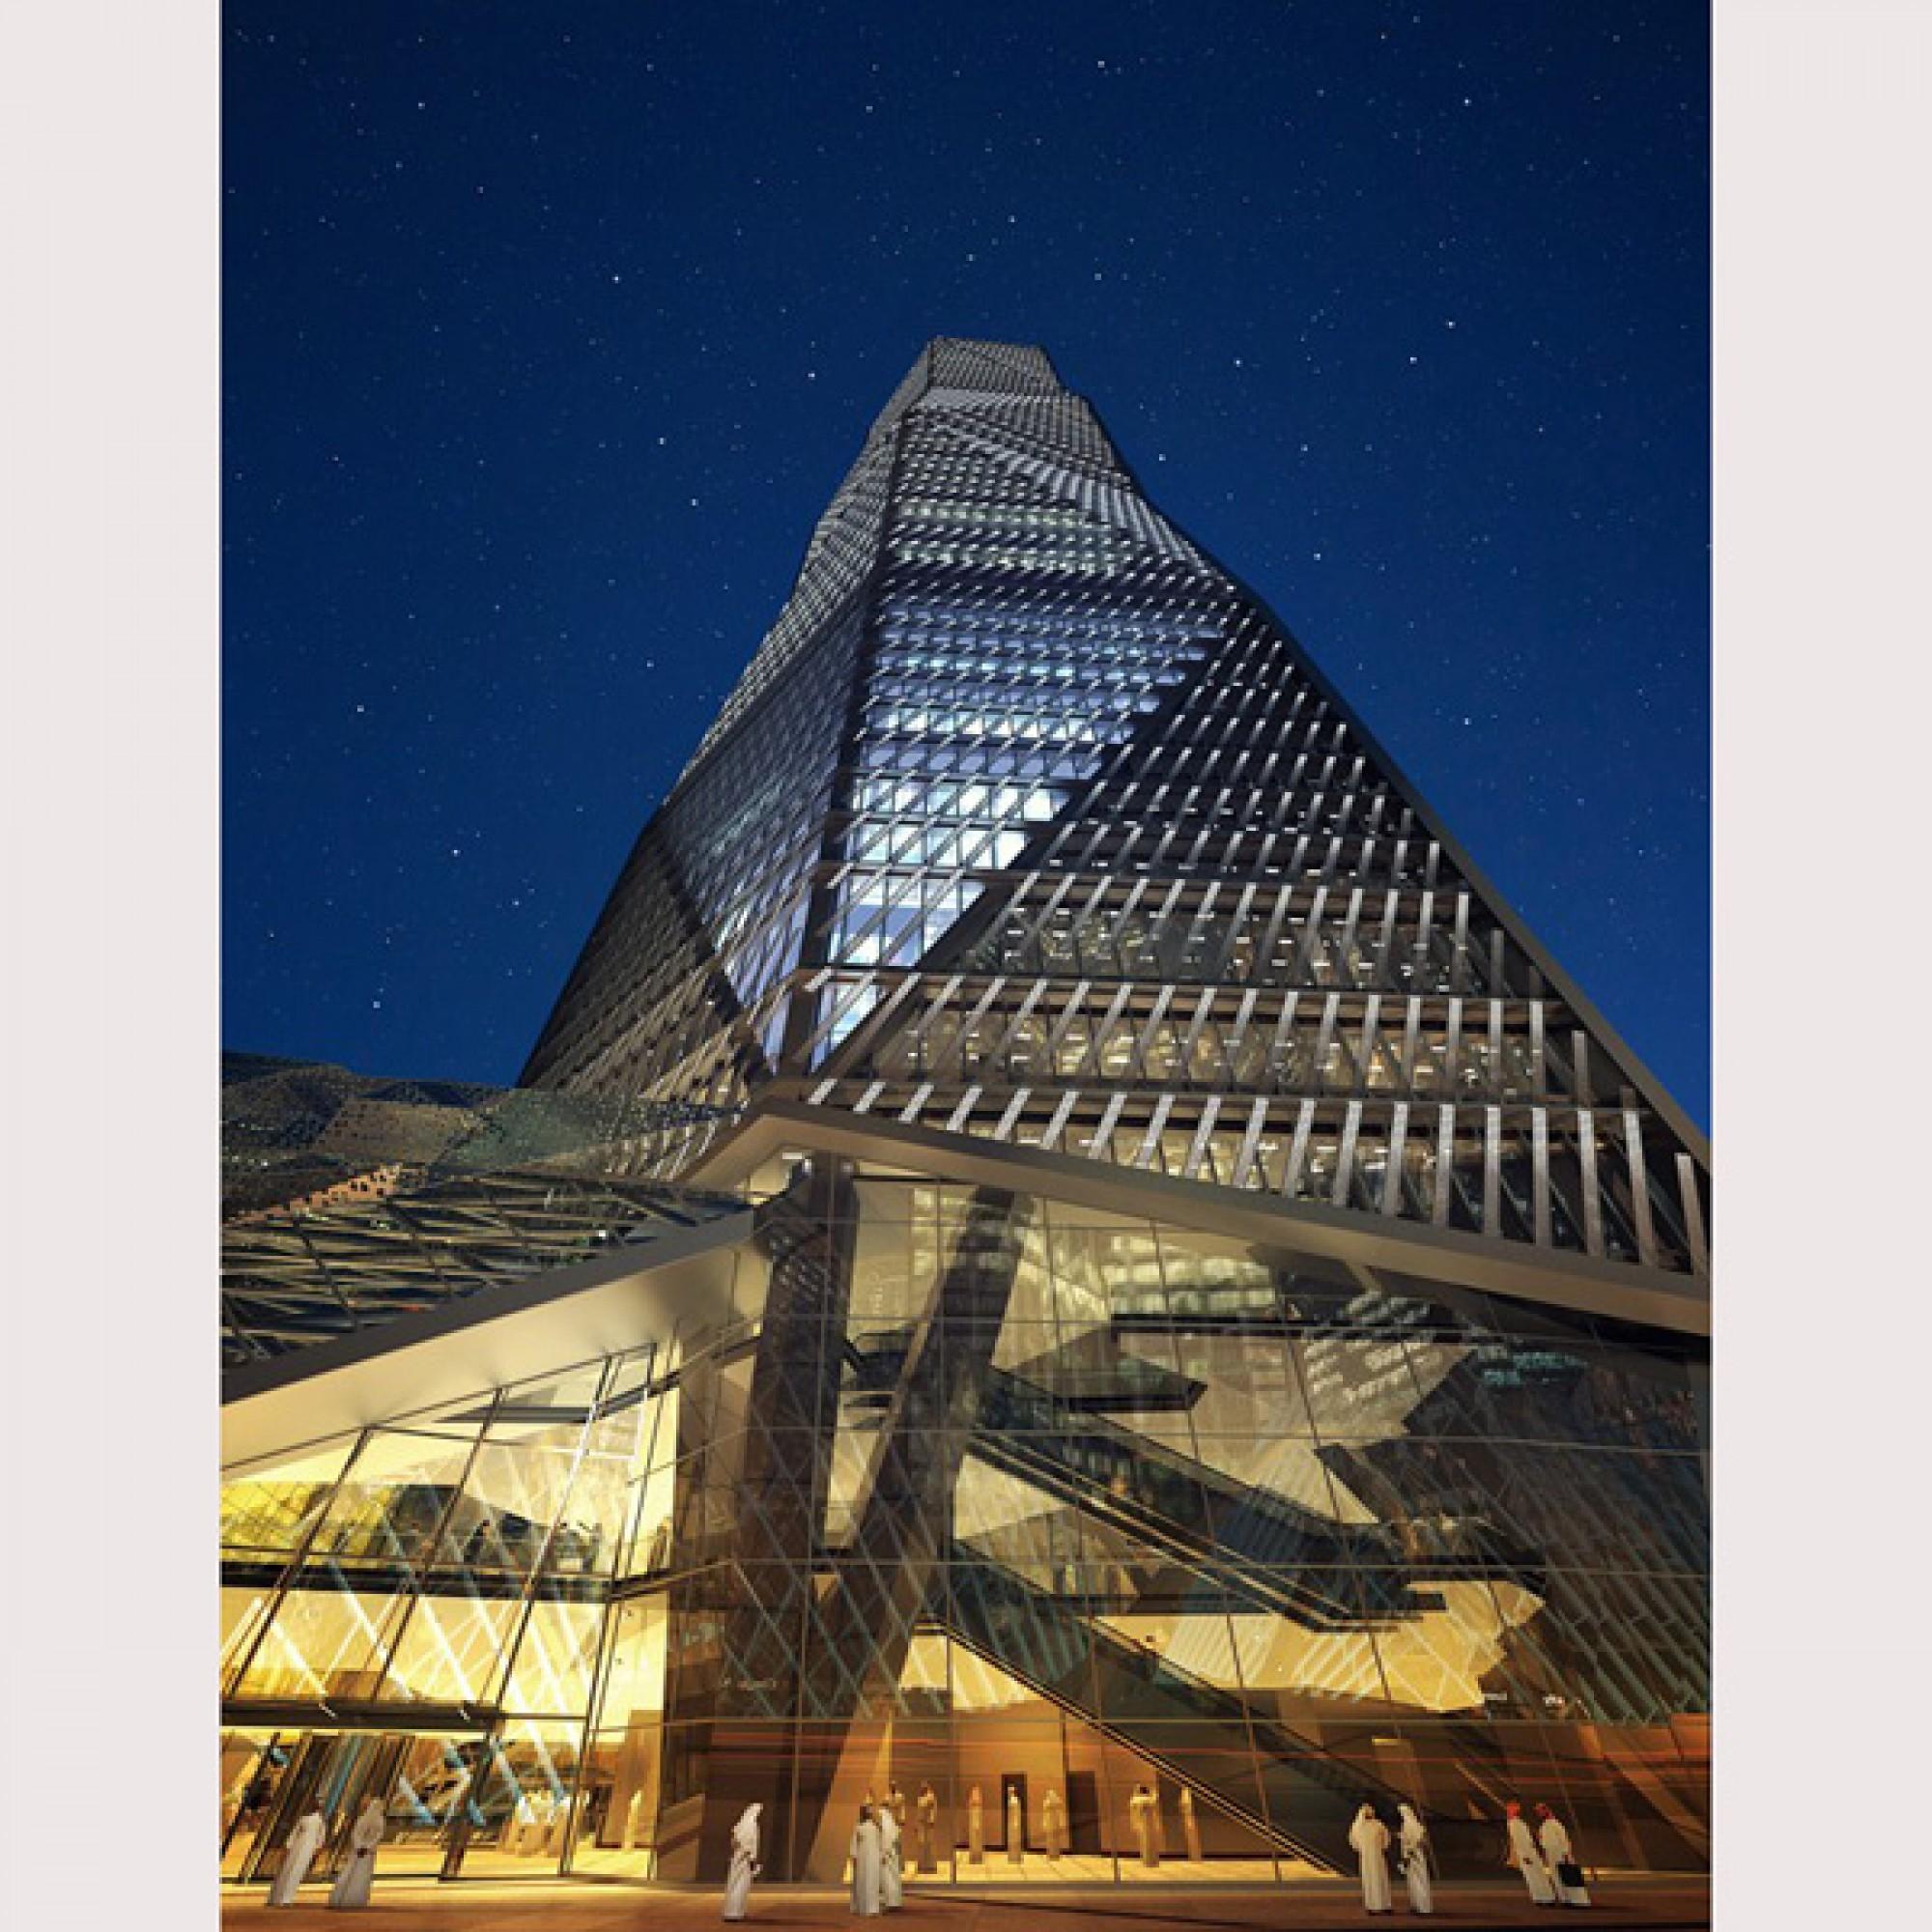 Capital Market Authority Tower, Riad, Saudi Arabien (DOQ via CTBUH)